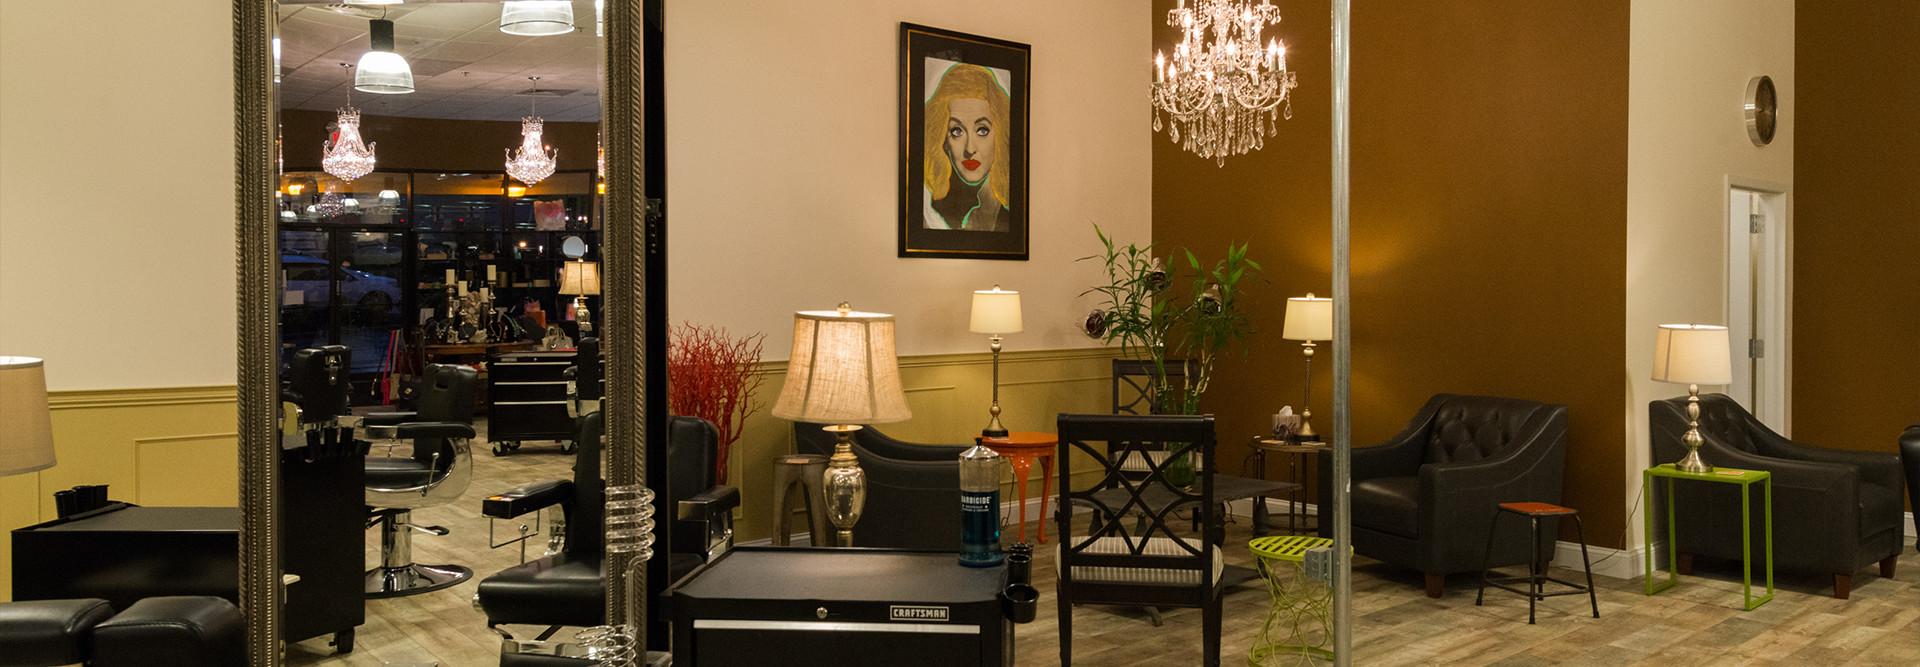 slider-style-lounge-mirrow